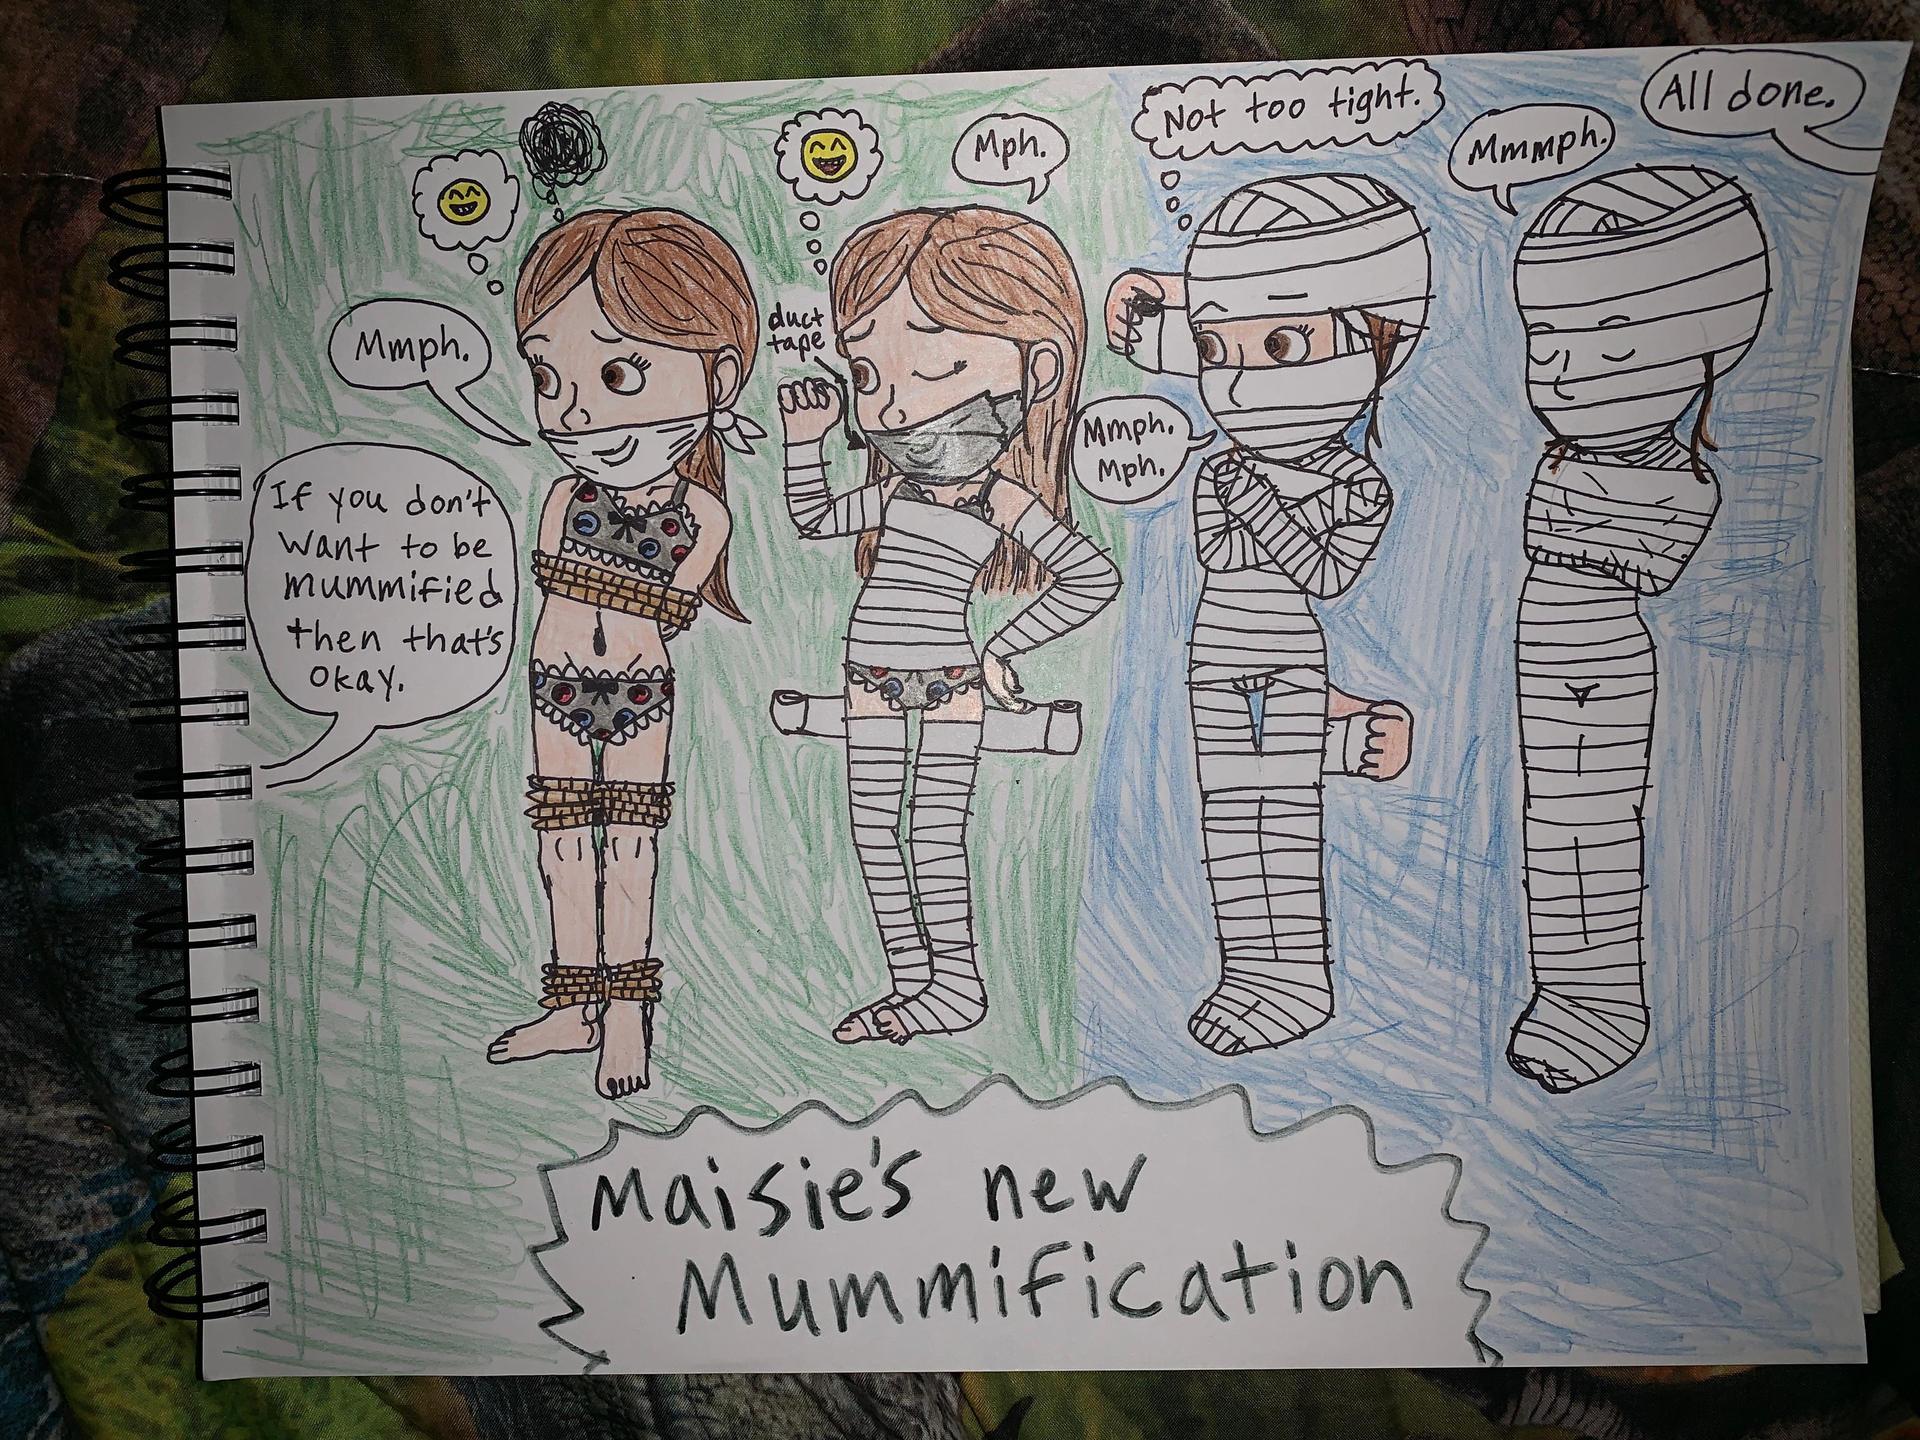 Maisie's Mummification 2 by PeteDRaptor on DeviantArt